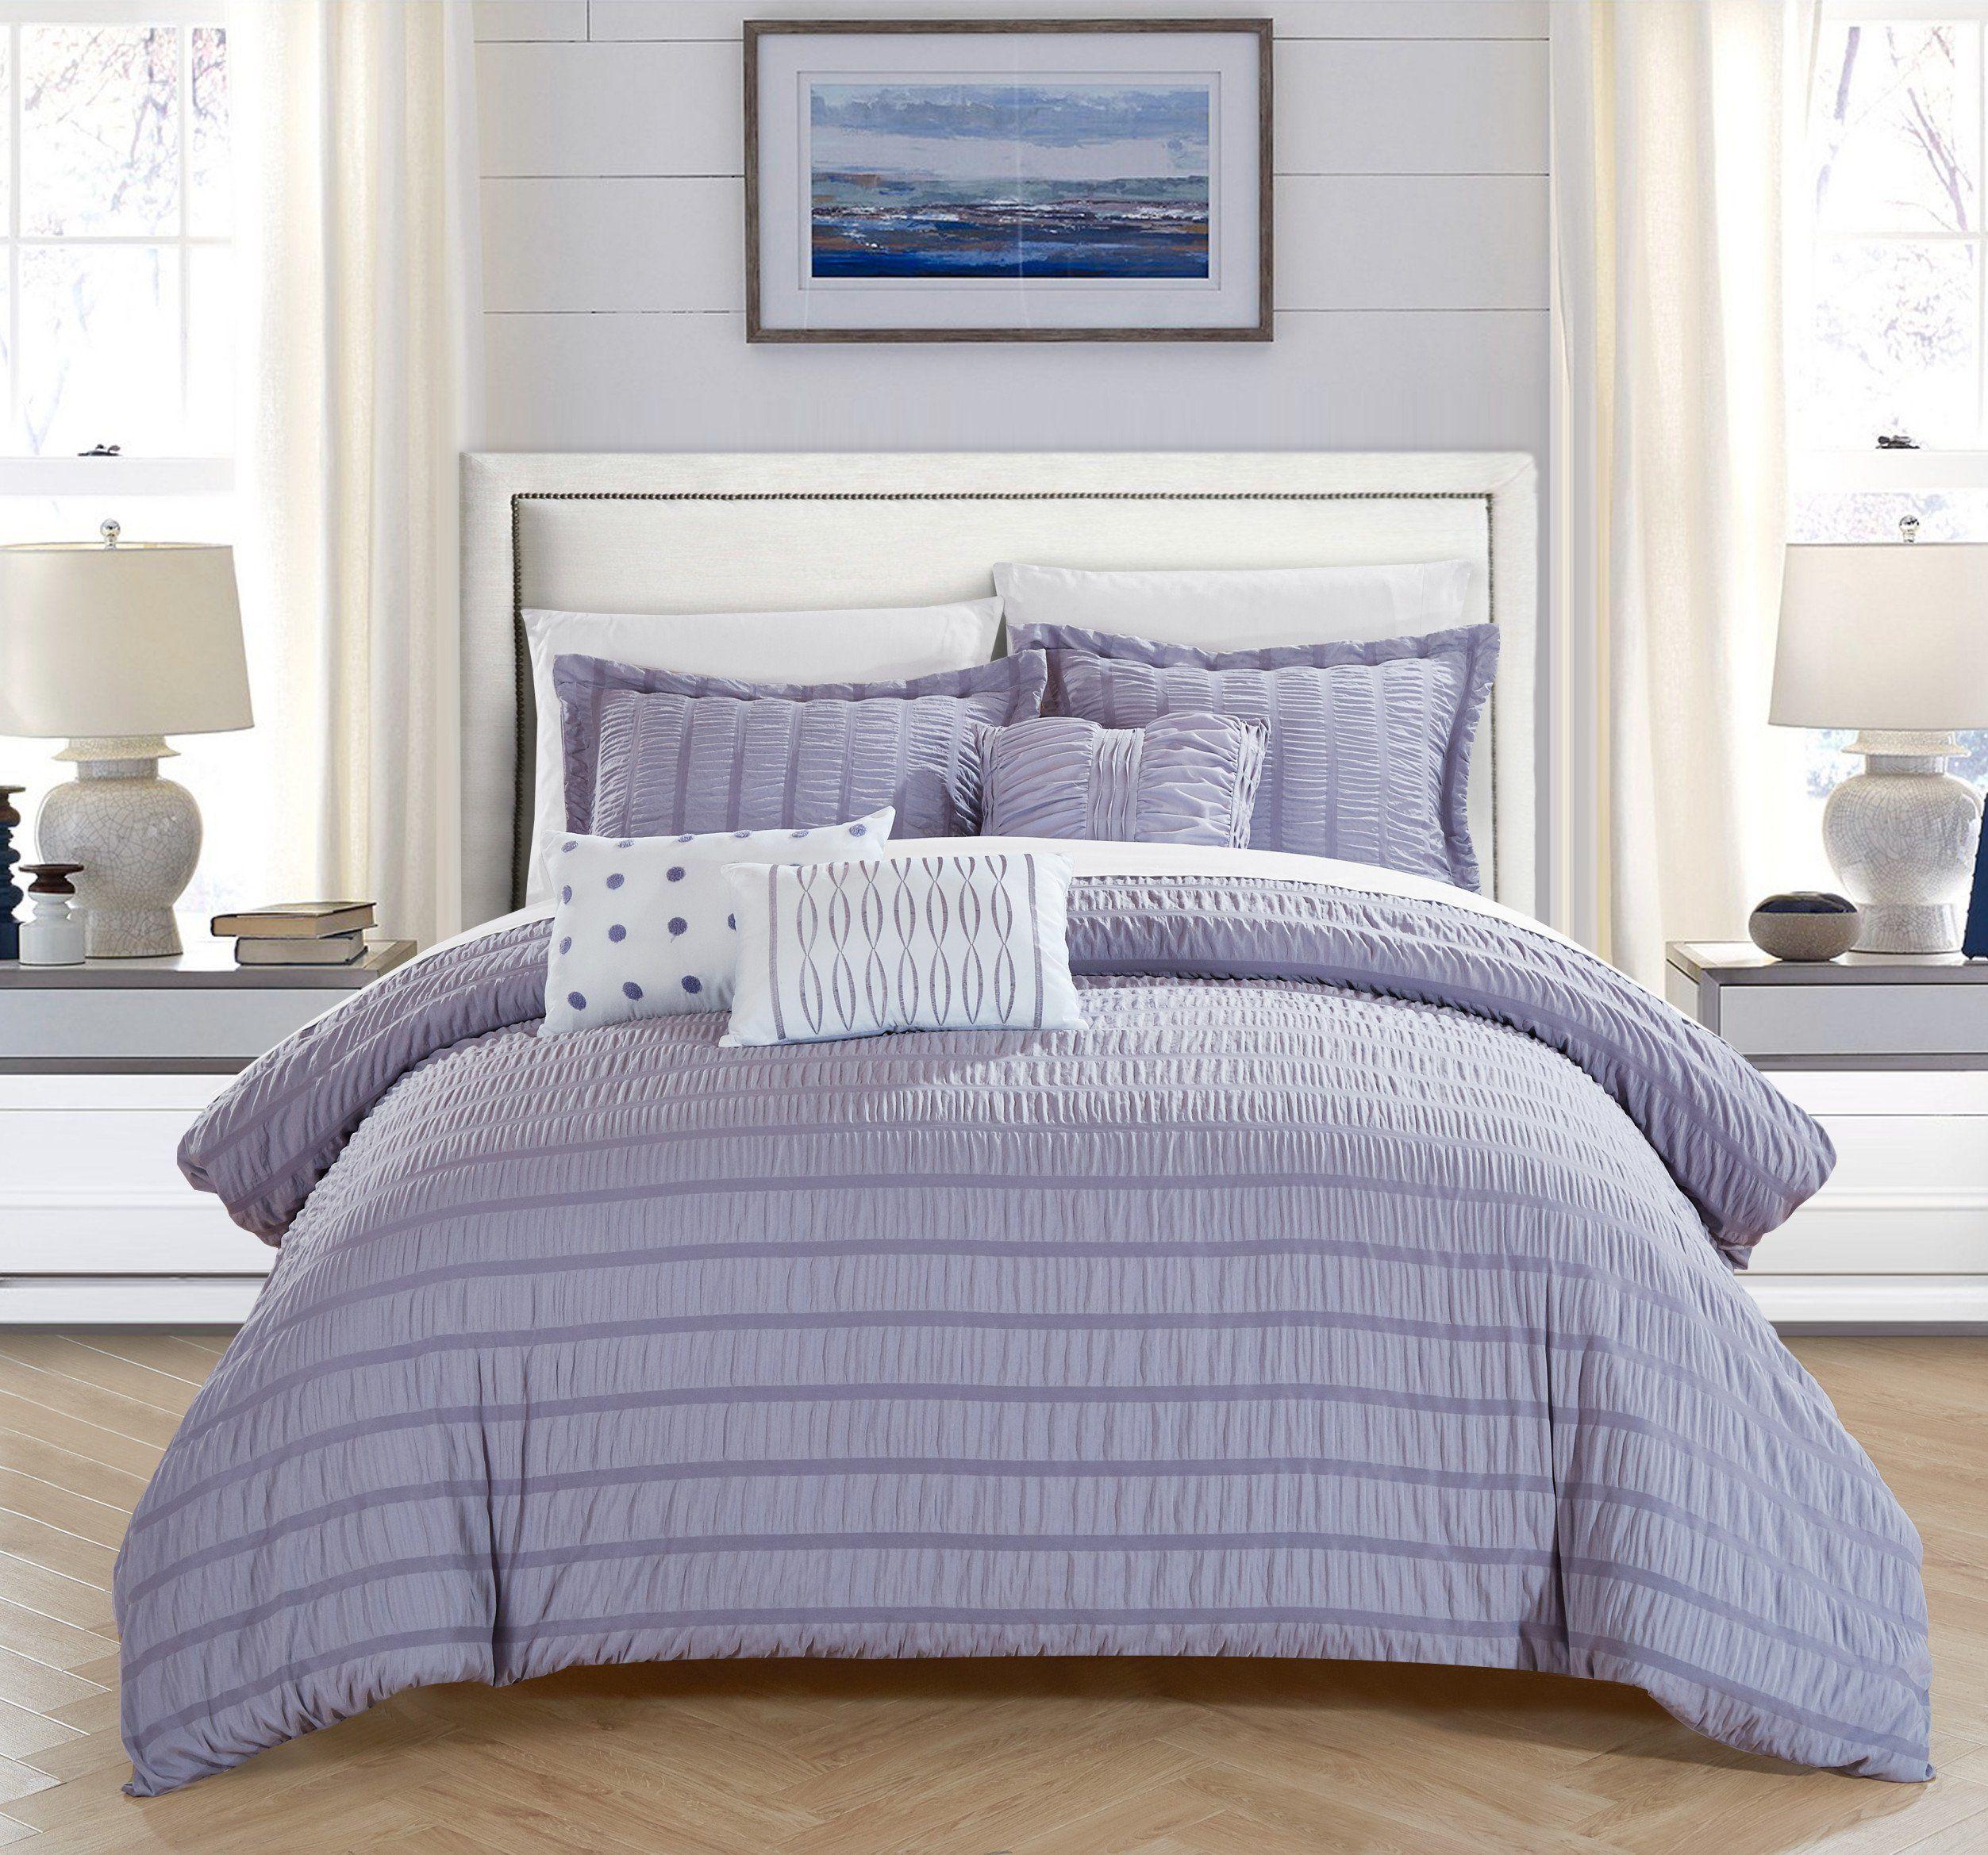 Chic Home Hadassah 10 Piece Comforter Set Striped Ruched Ruffled